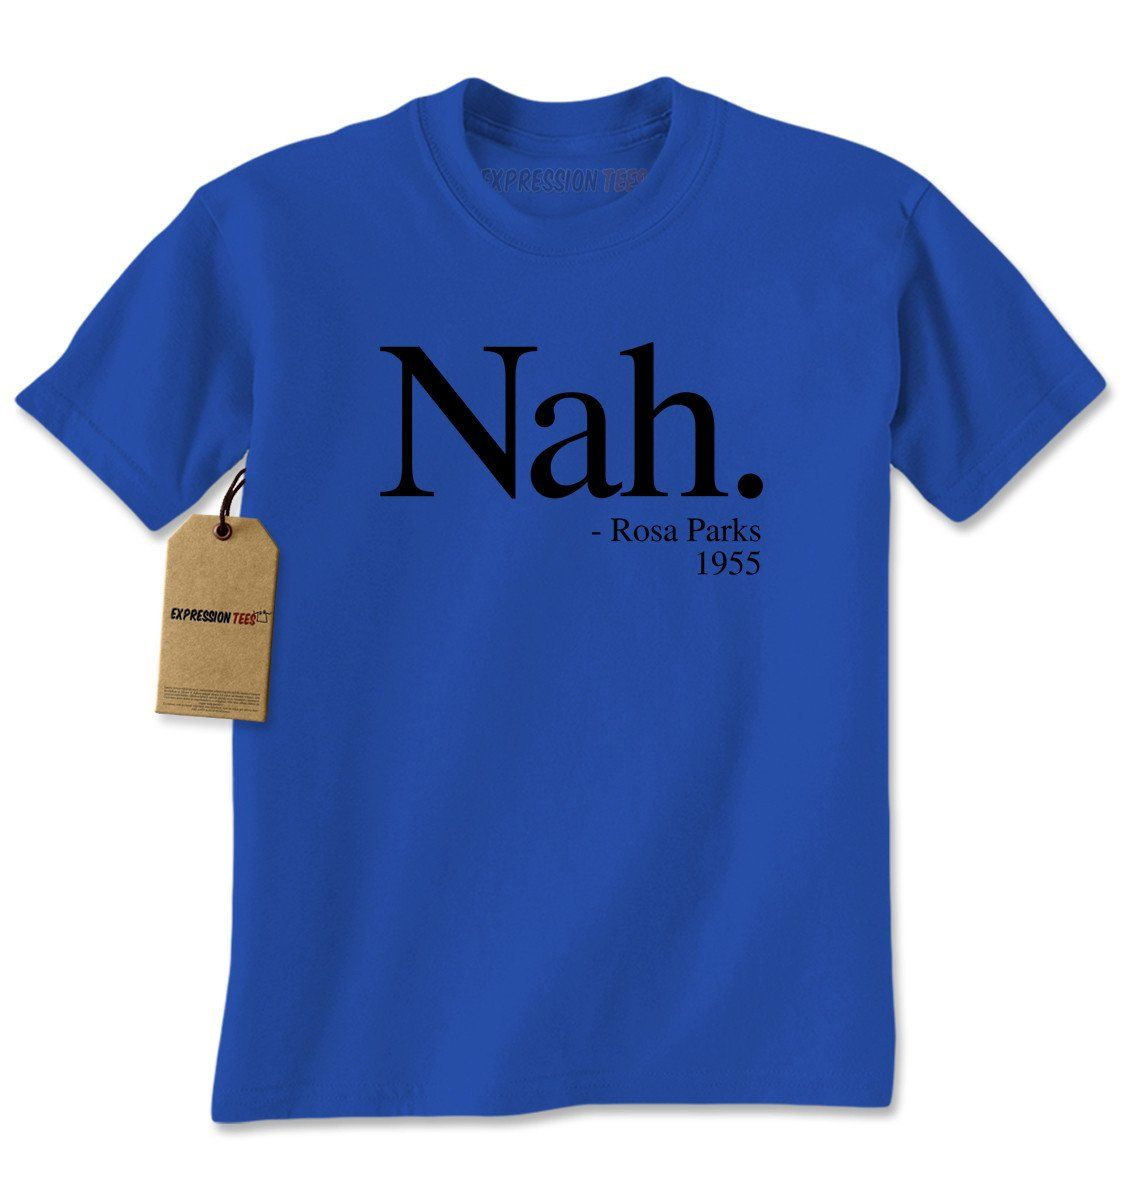 Nah. (Black Print) Rosa Parks, 1955 Quote Mens T-shirt